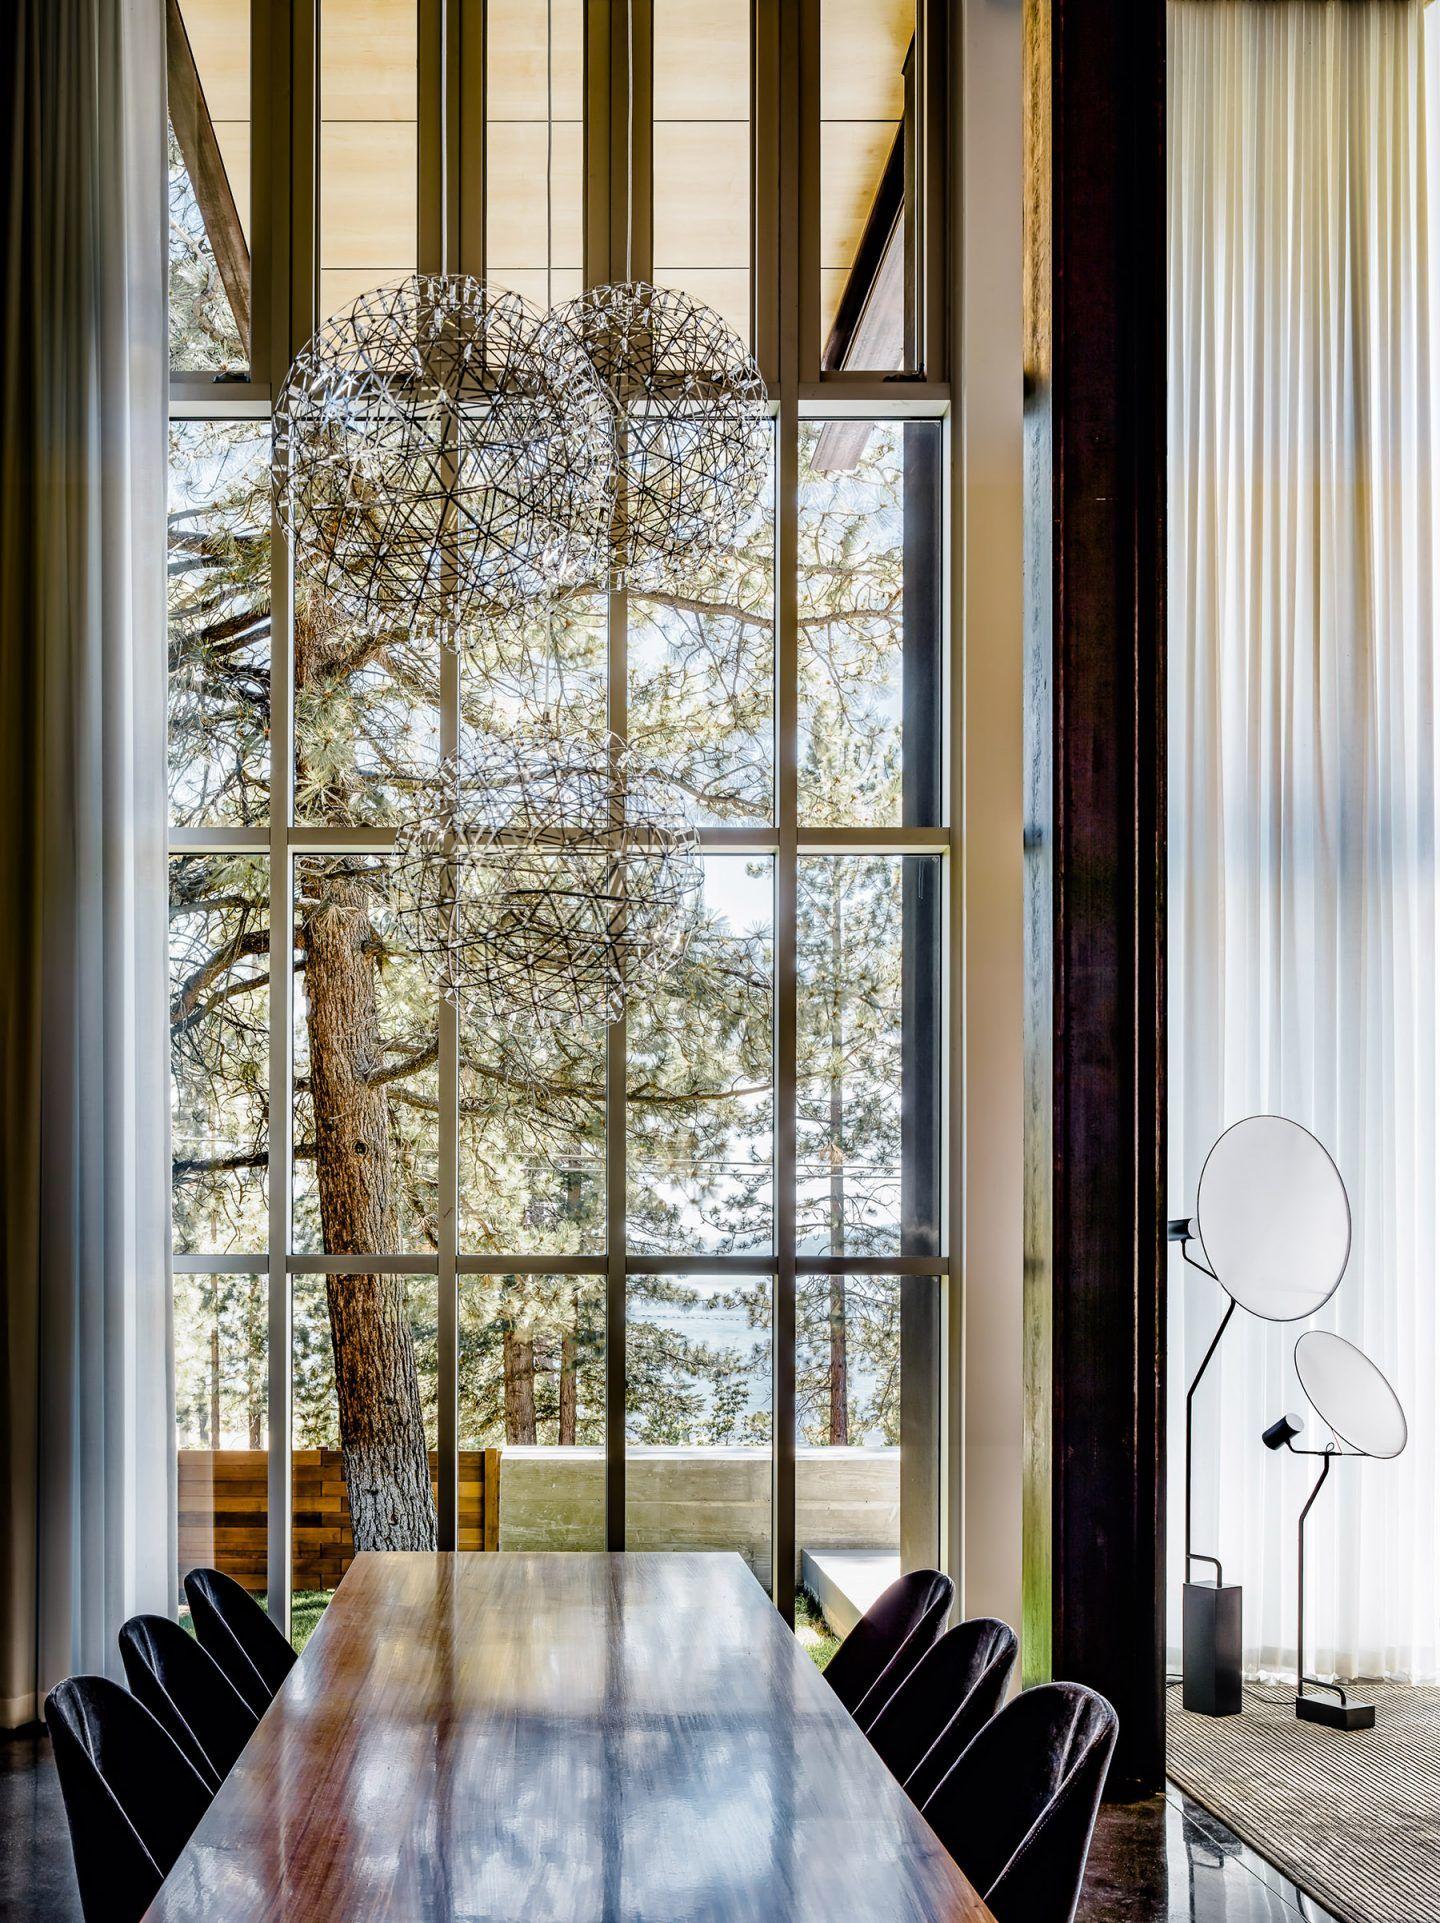 IGNANT-Architecture-Faulkner-Architects-Burnt-Cedar-016